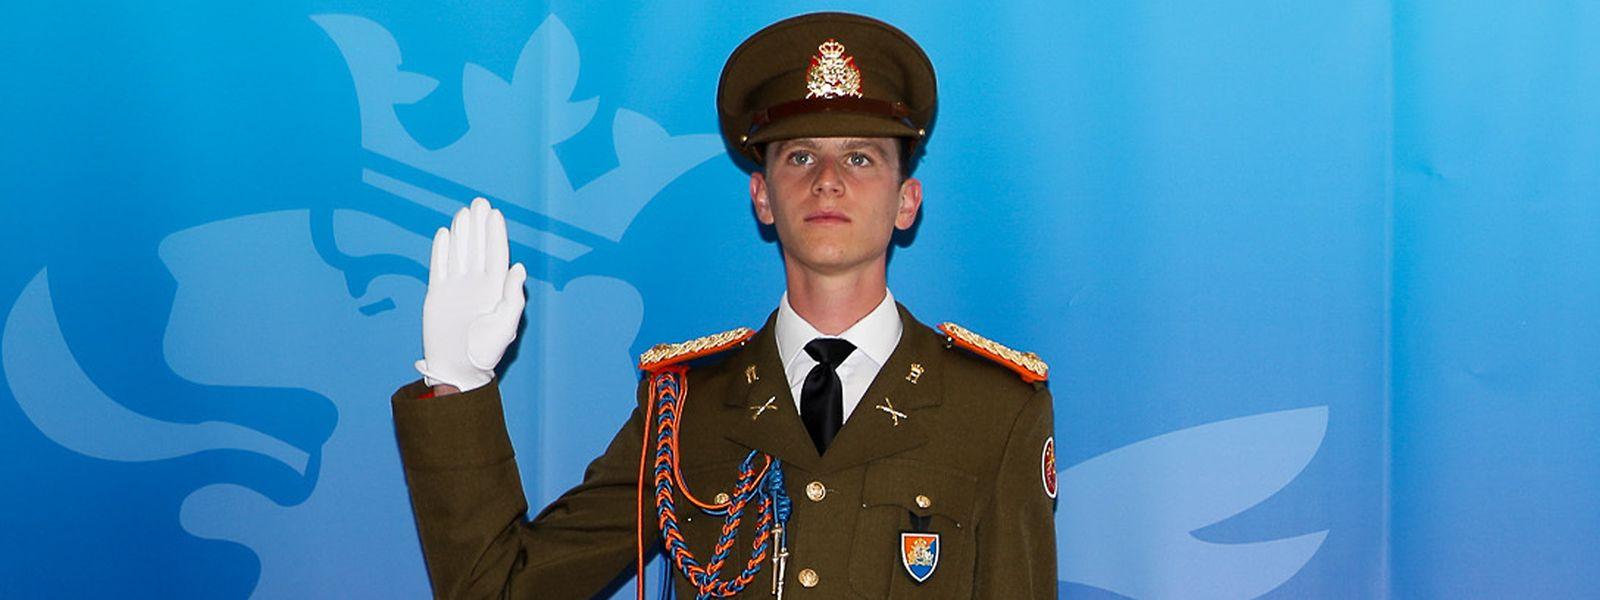 Prinz Paul-Louis de Nassau bei seiner Vereidigung als Offizier der Luxemburger Armee.